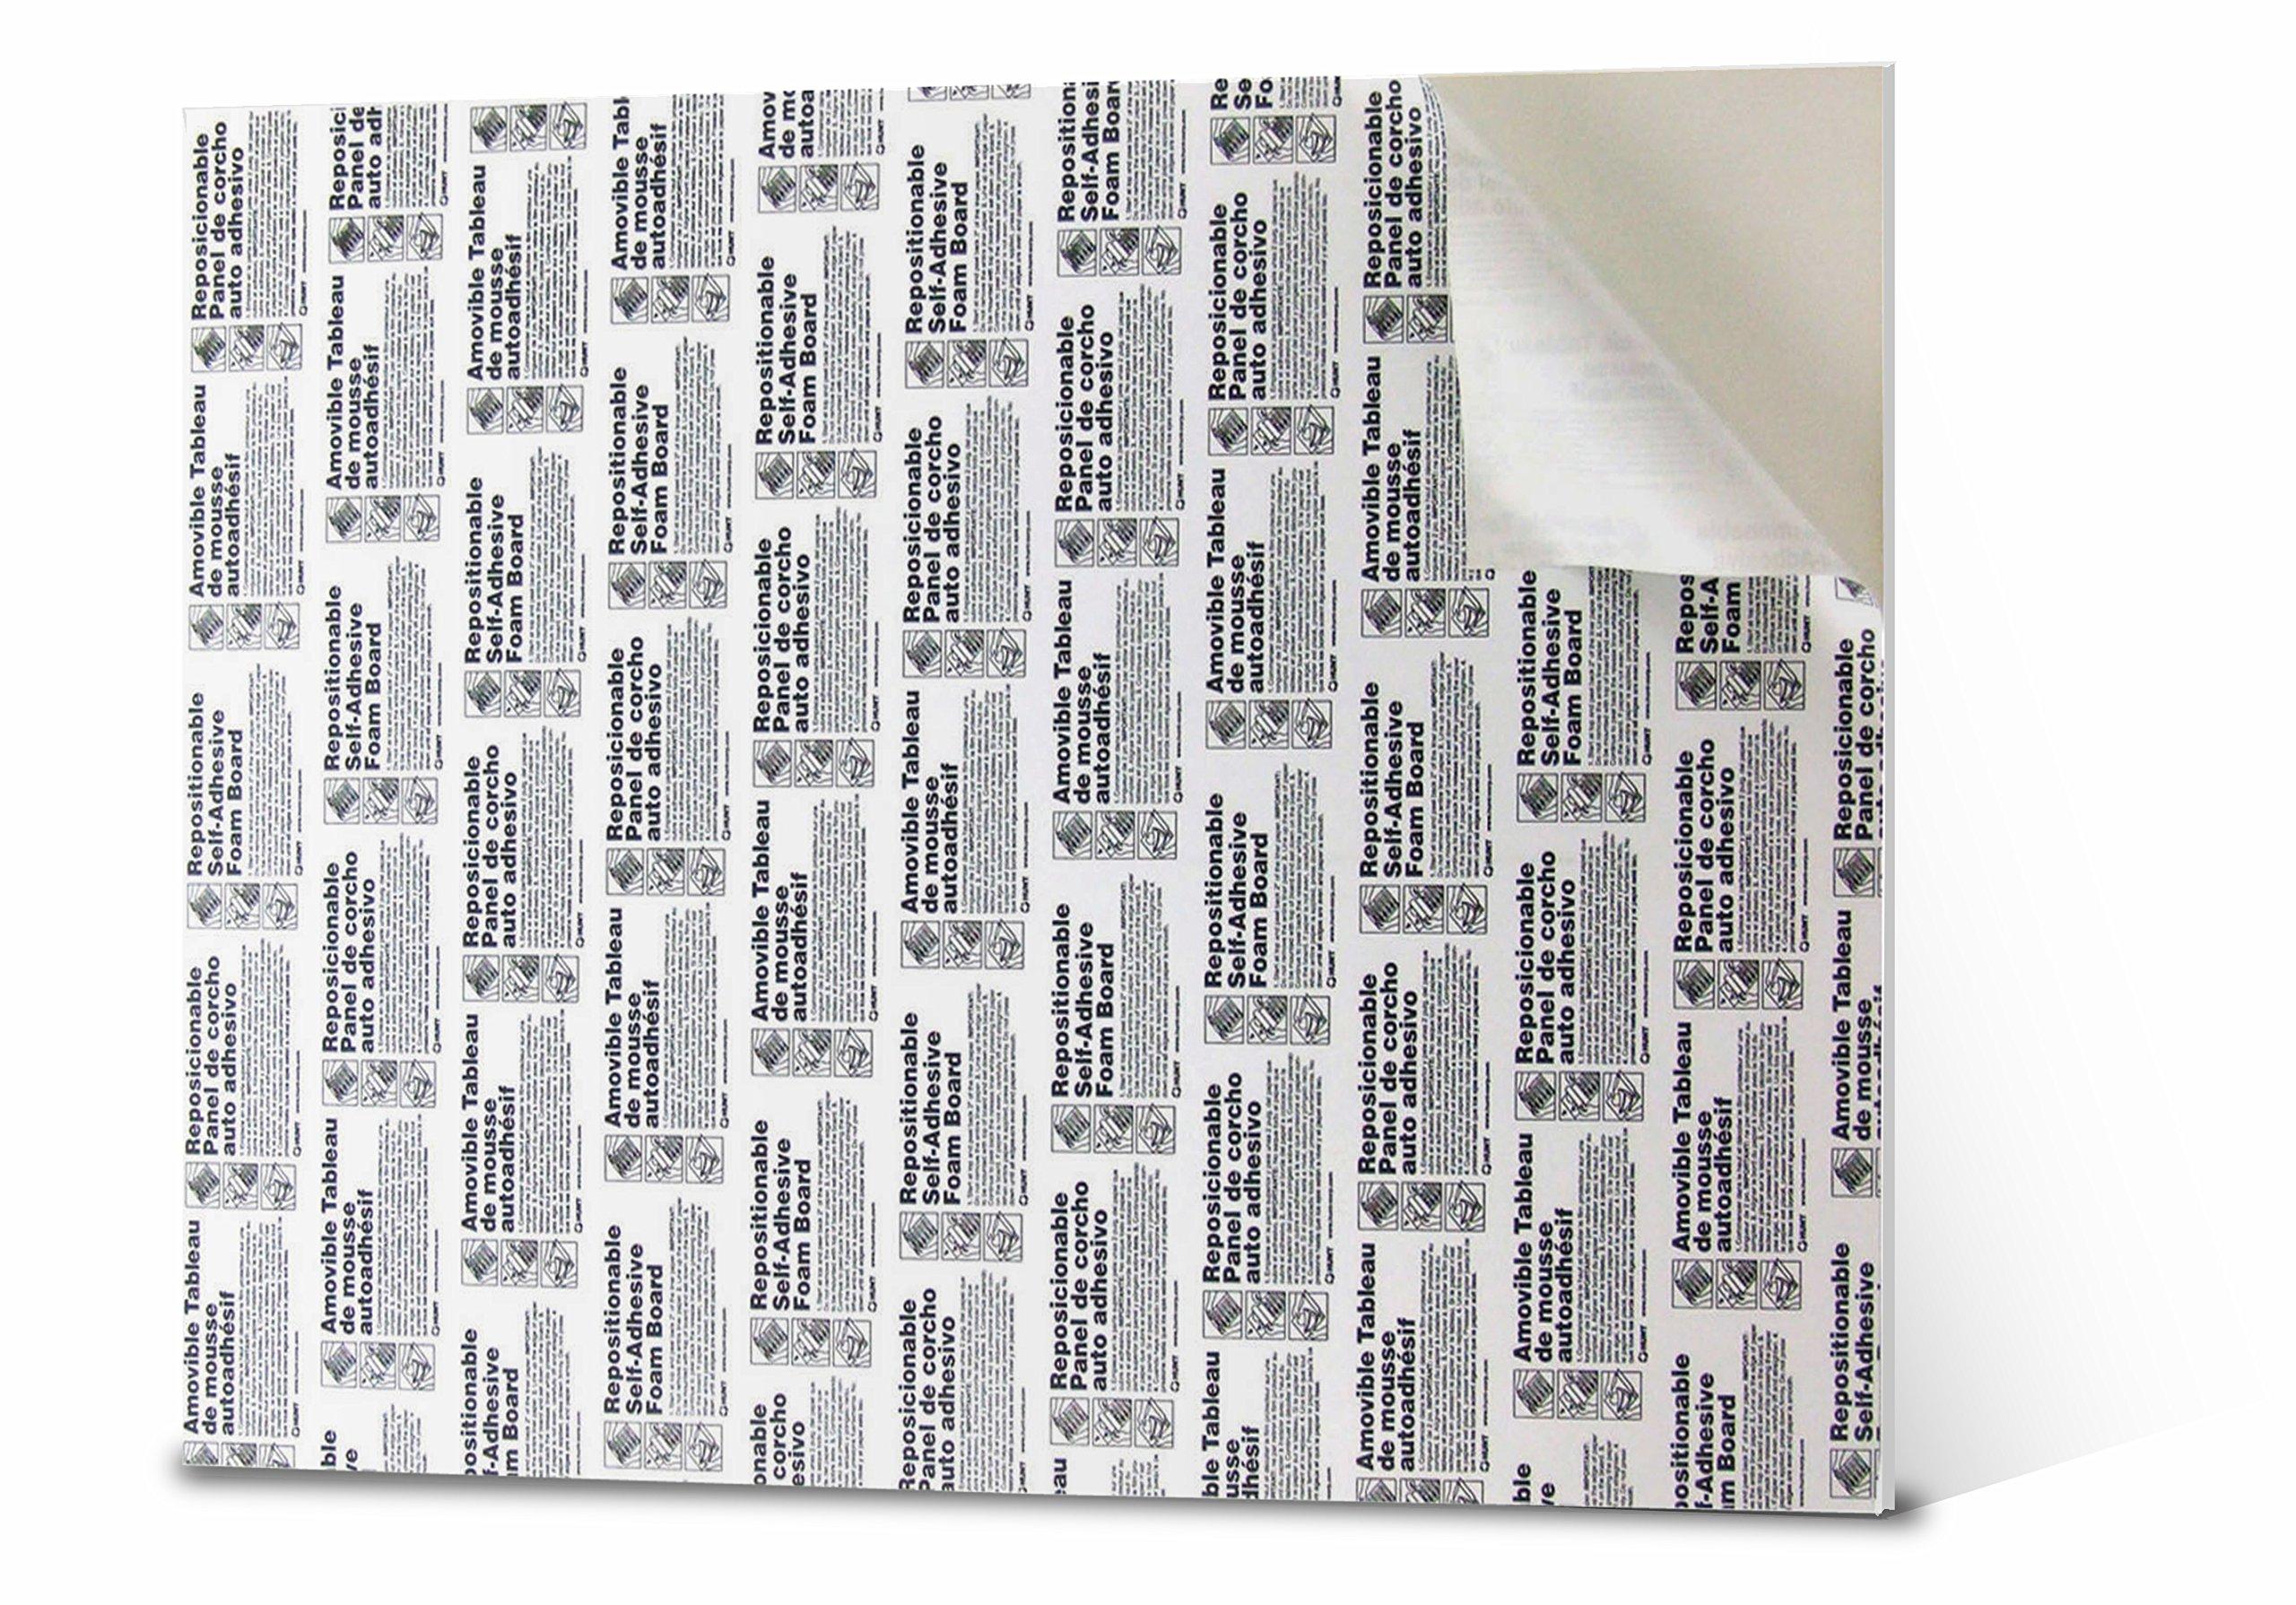 12x18 self adhesive poster board